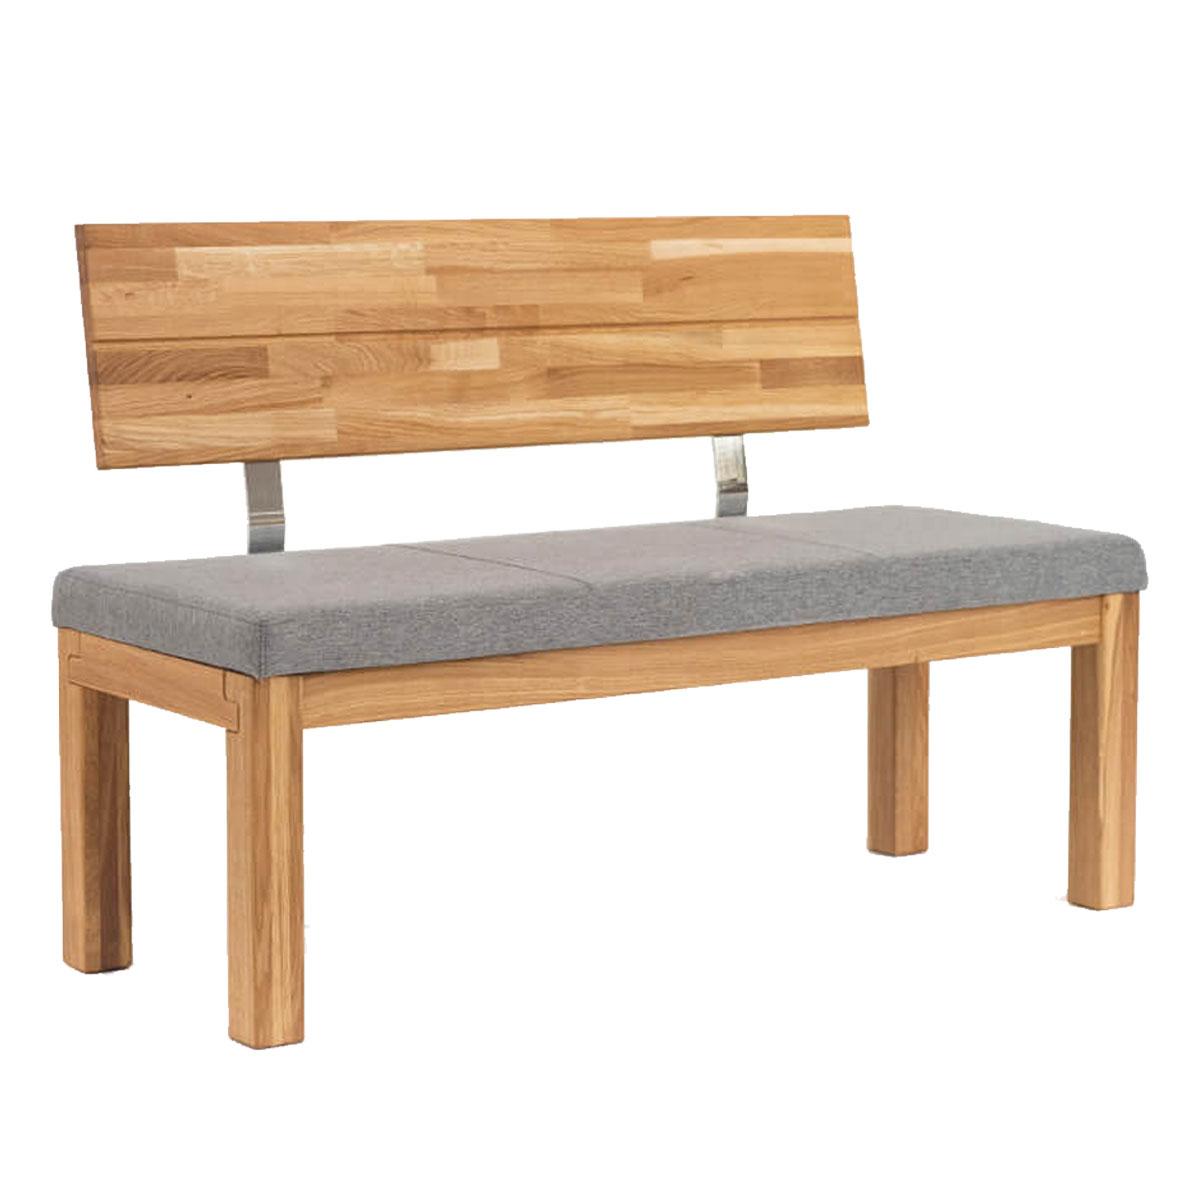 Standard Furniture Sitzbank Catania mit Lehne Massivholz Eiche Sitzpolster grau   eBay